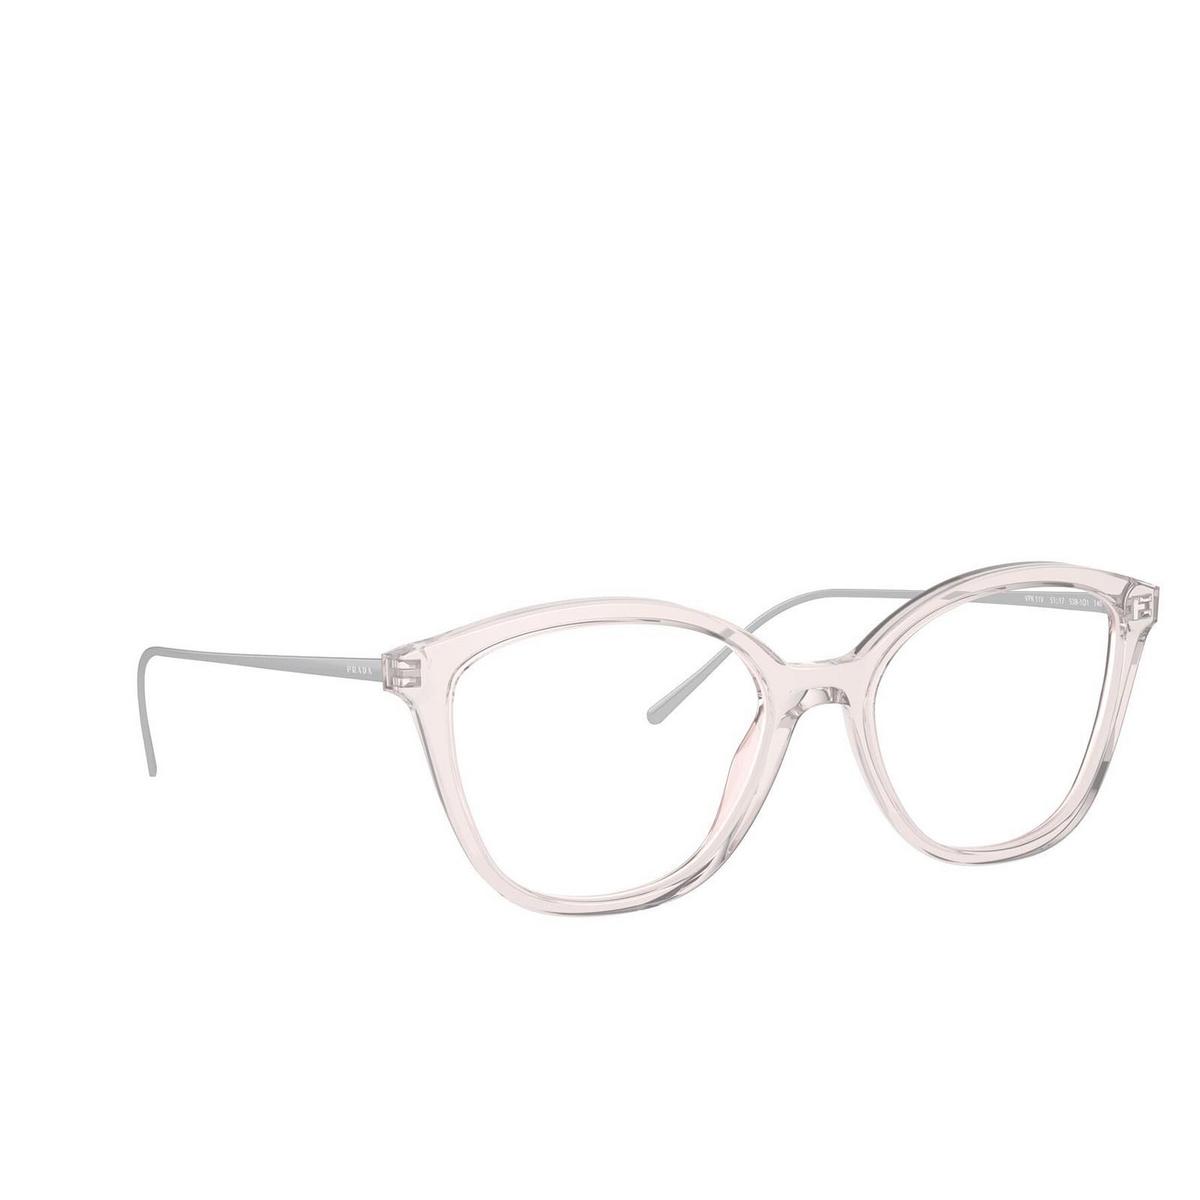 Prada® Square Eyeglasses: PR 11VV color Crystal Pink 5381O1.